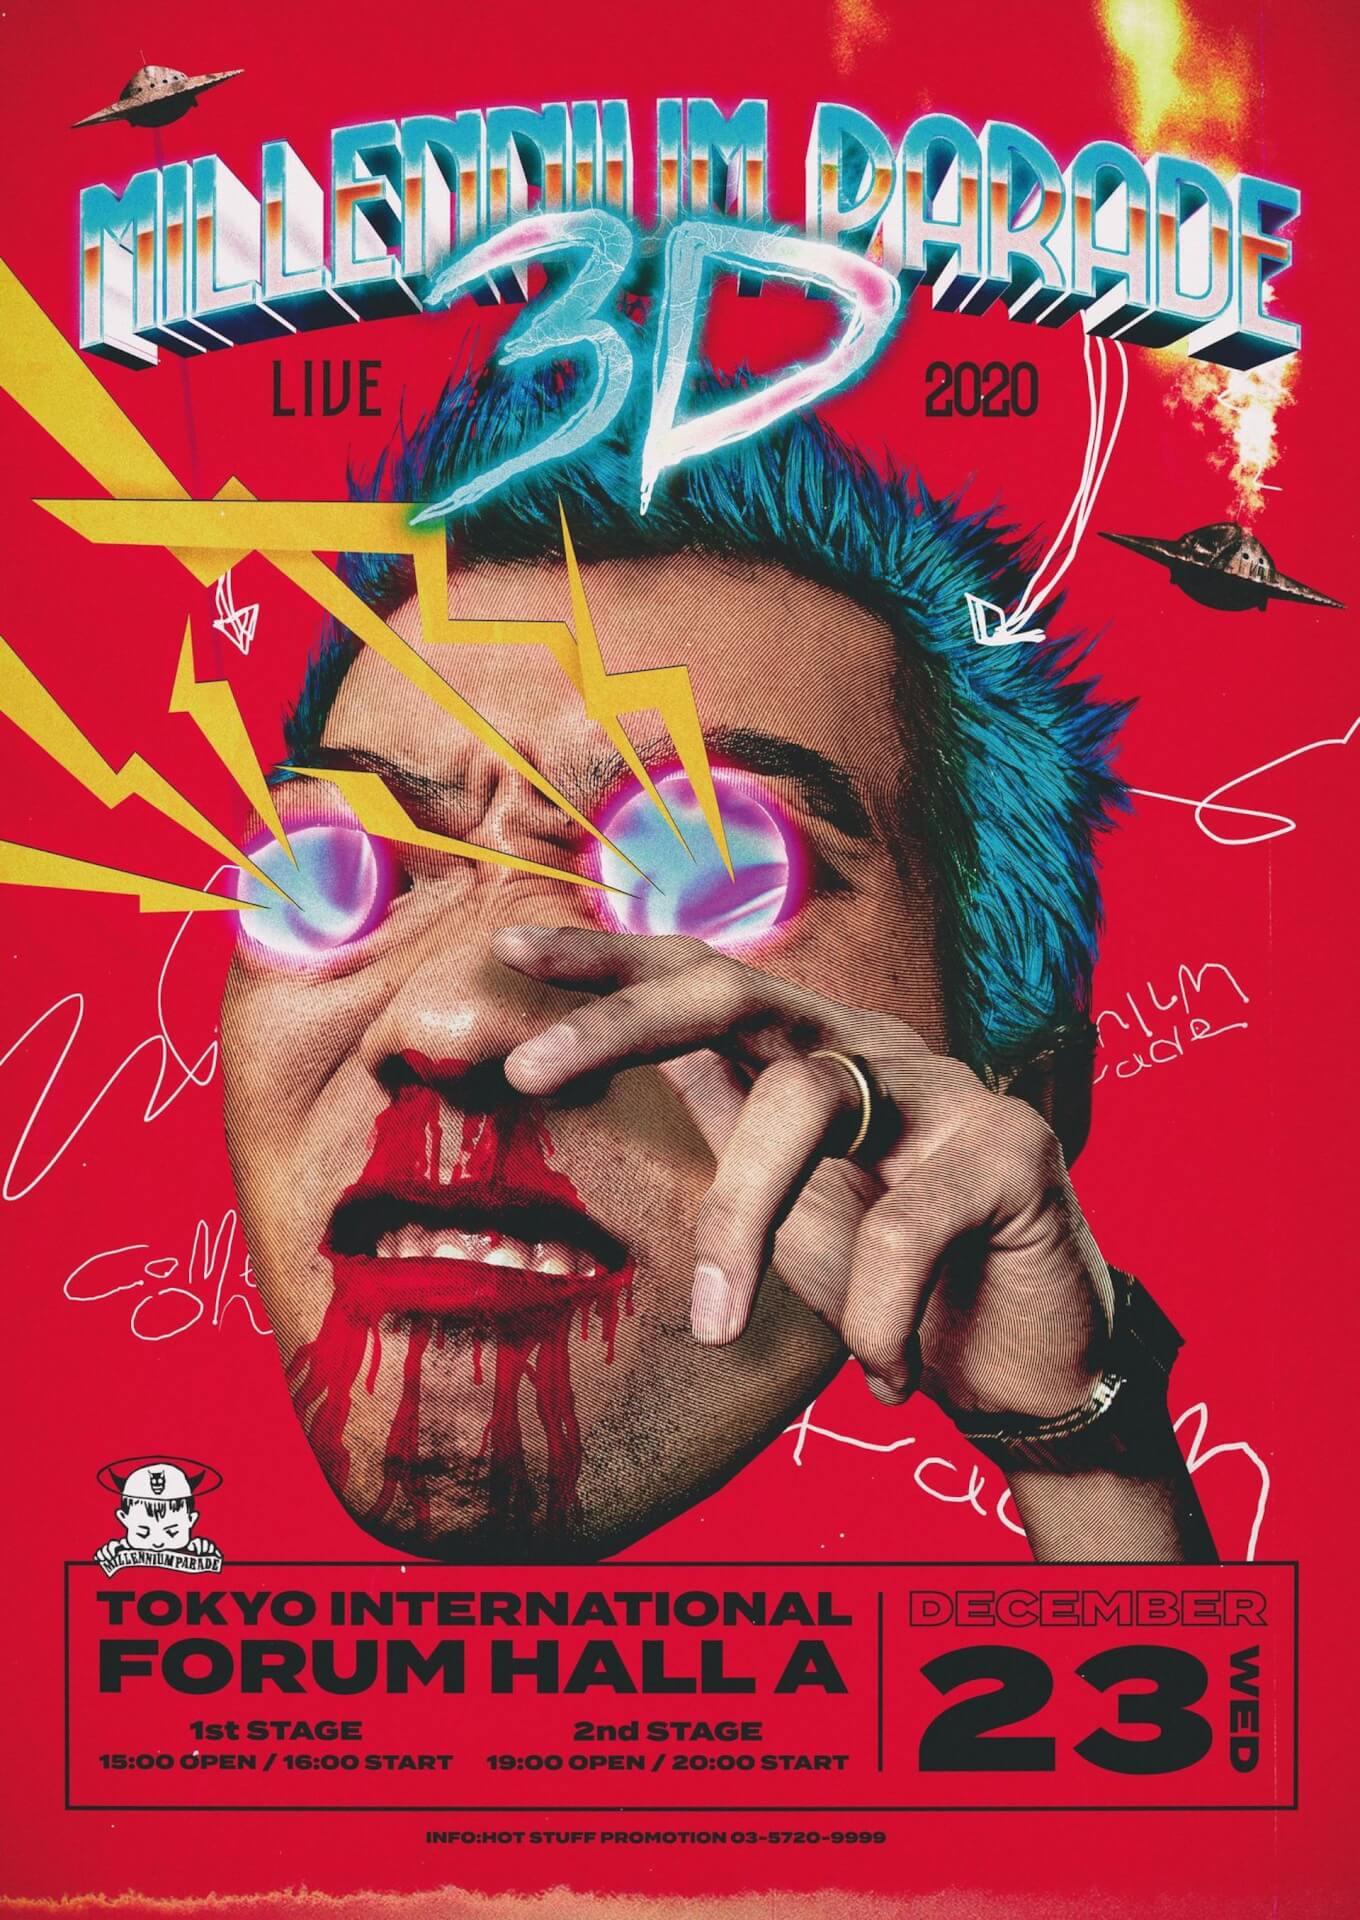 King Gnu常田大希のソロプロジェクト・millennium paradeの1stアルバムがリリース決定!3Dライブの開催も発表 music201125_millenniumparade_4